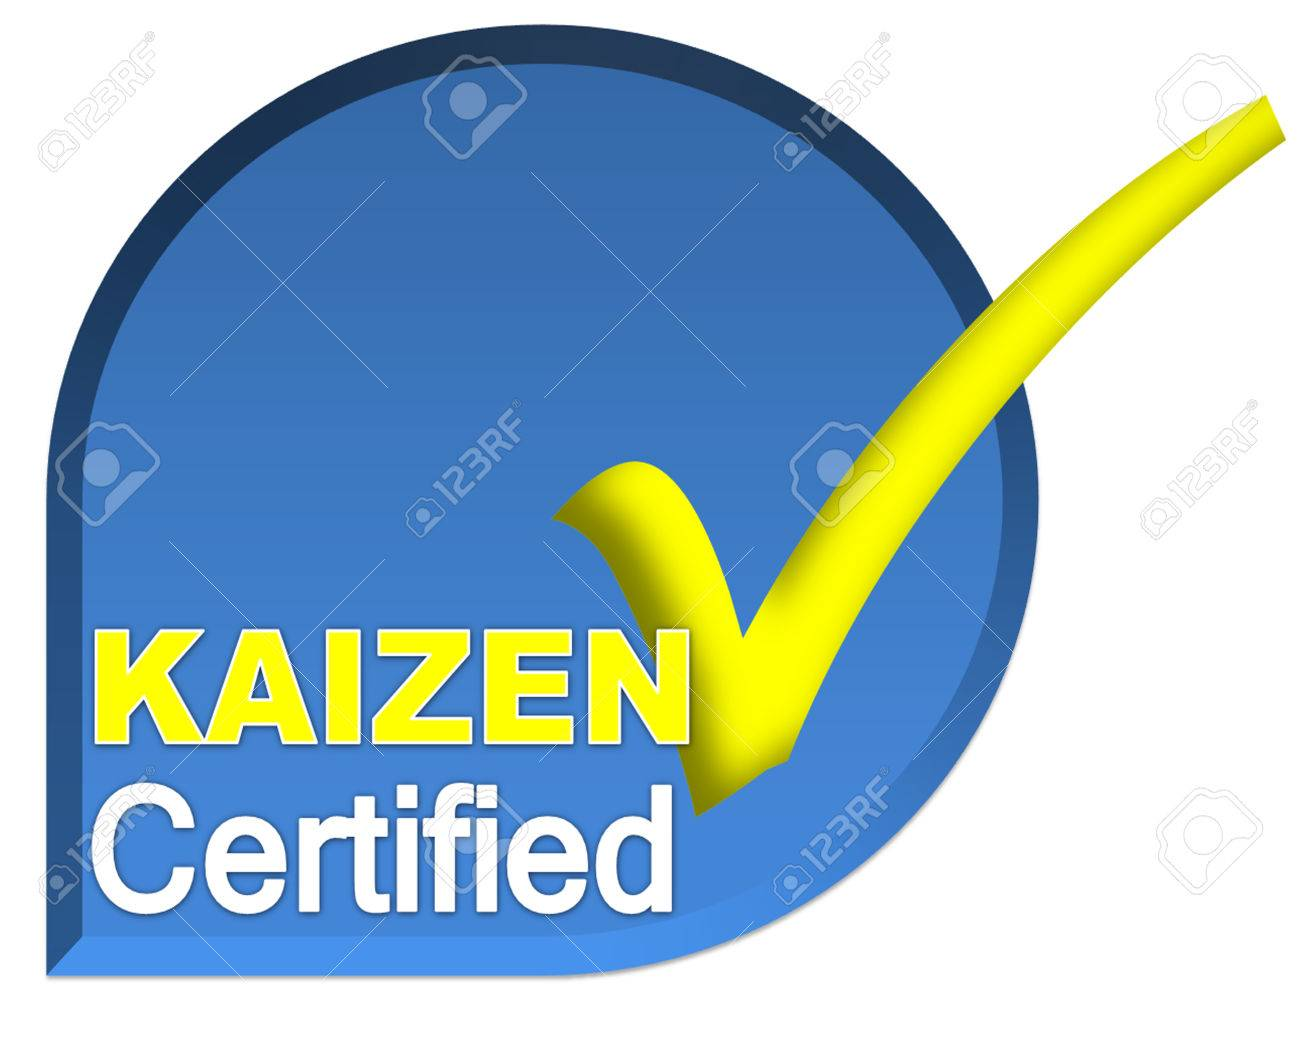 Certificate Logo Or Symbol Of Kaizen System On Blue Color